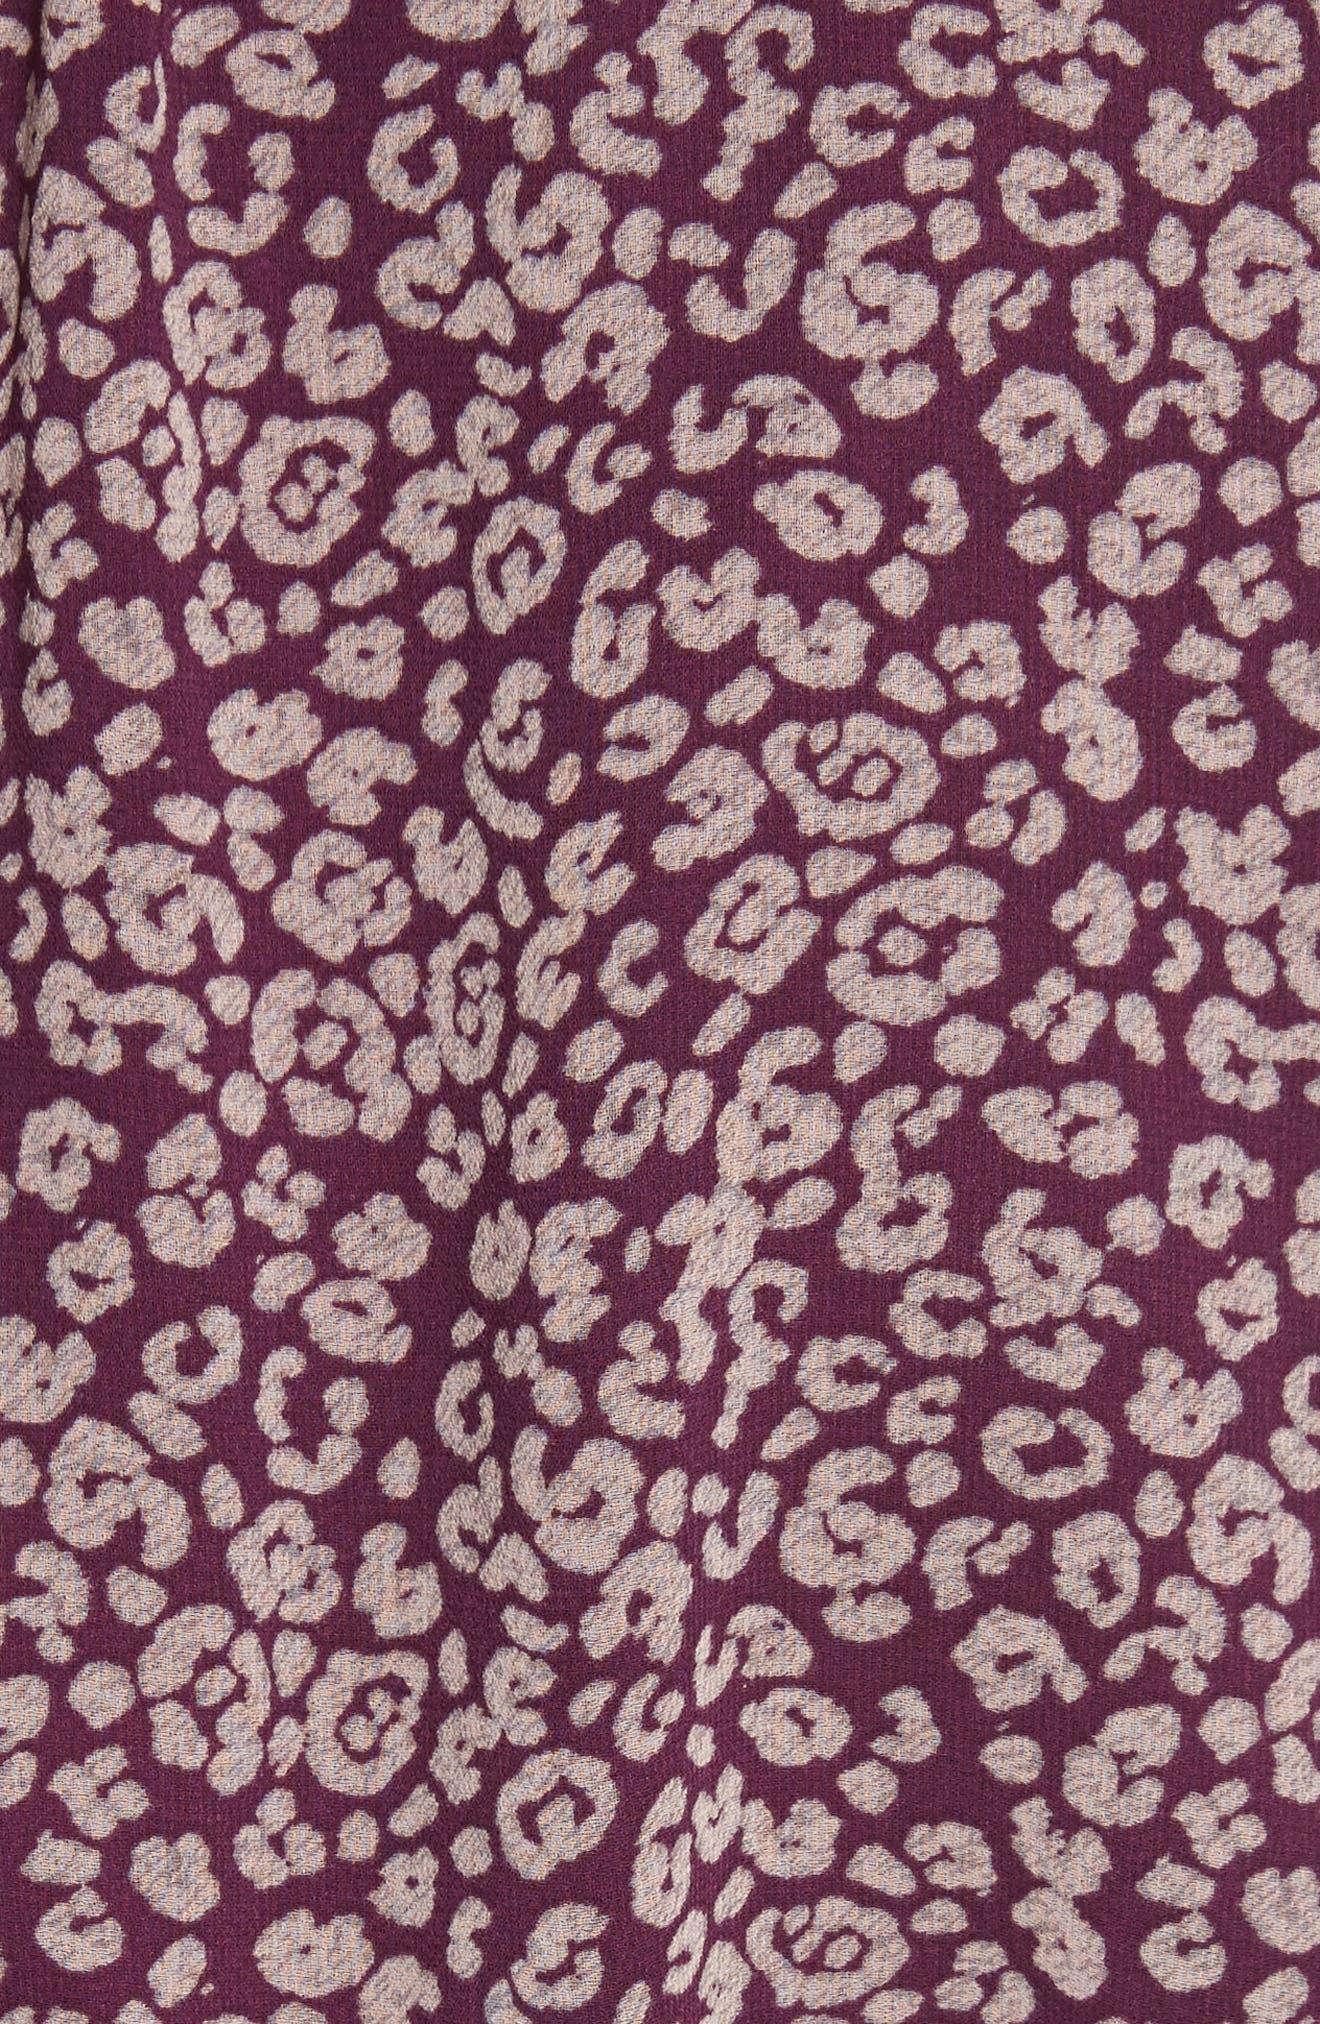 Rosemary A-Line Dress,                             Alternate thumbnail 5, color,                             531